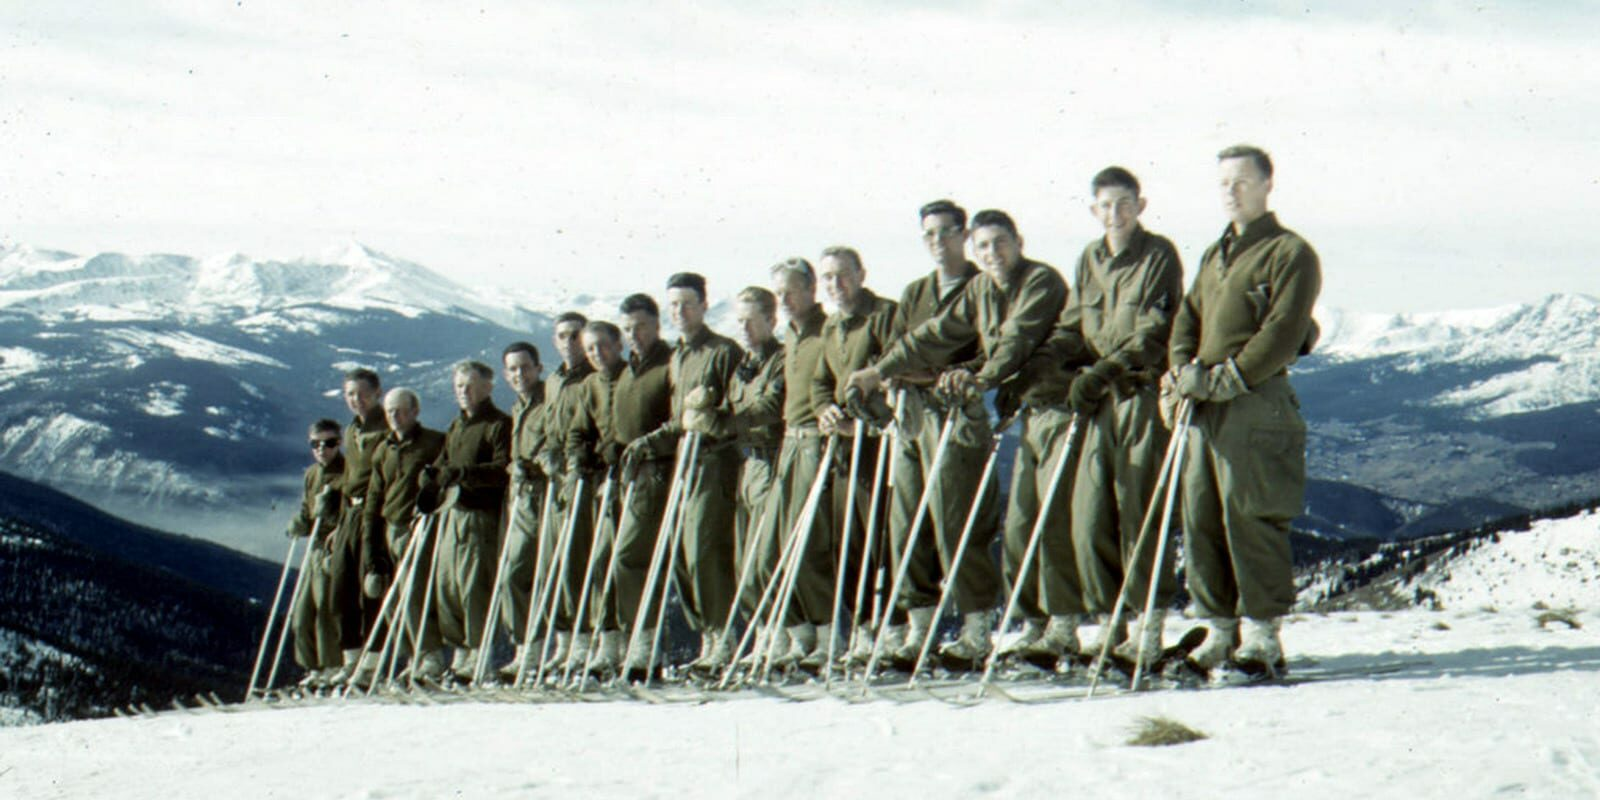 10th Mountain Division Ski Troopers Training in Colorado Circa 1943